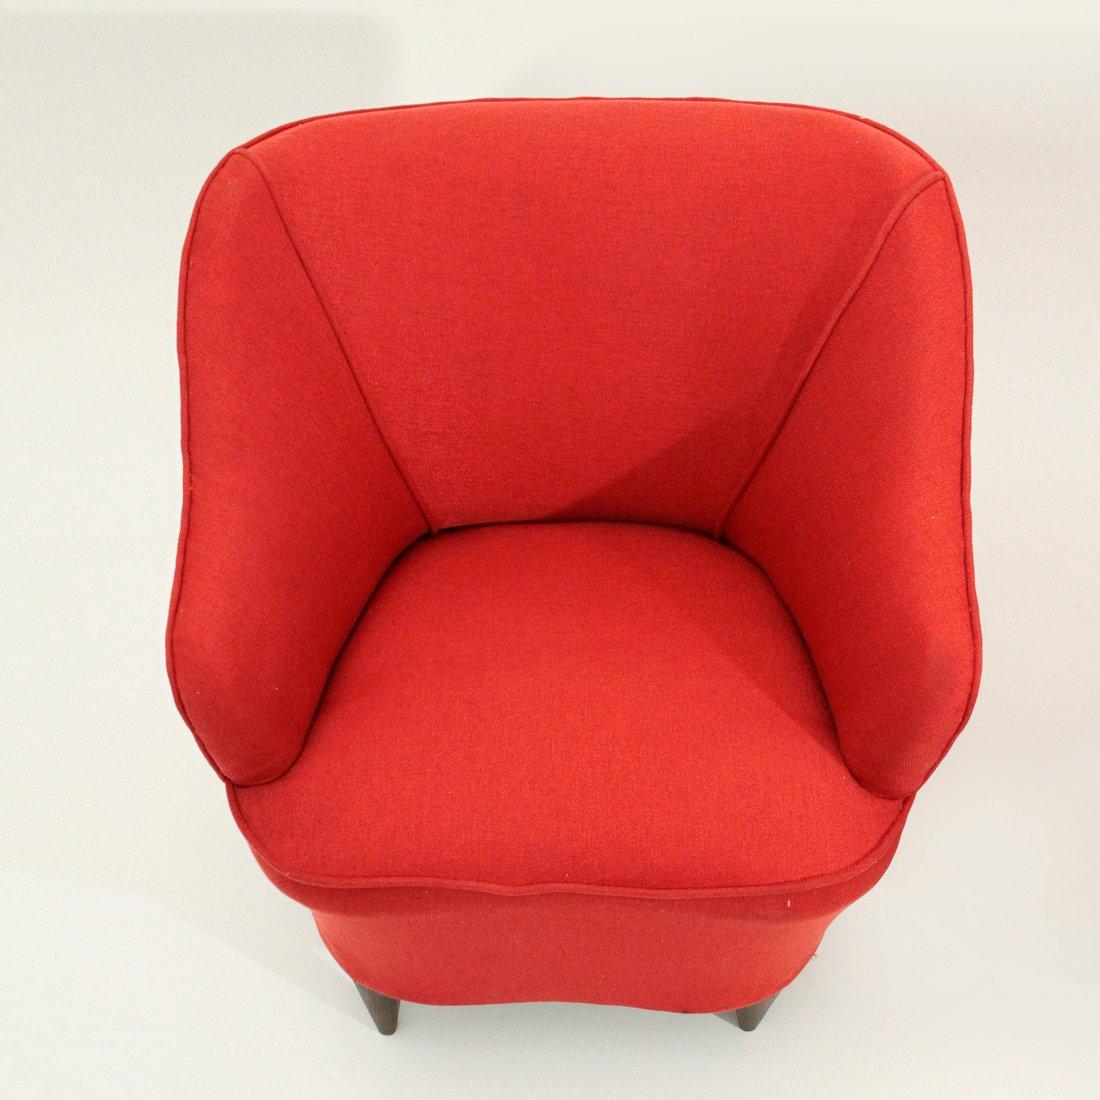 rote italienische sessel 1940er 2er set bei pamono kaufen. Black Bedroom Furniture Sets. Home Design Ideas